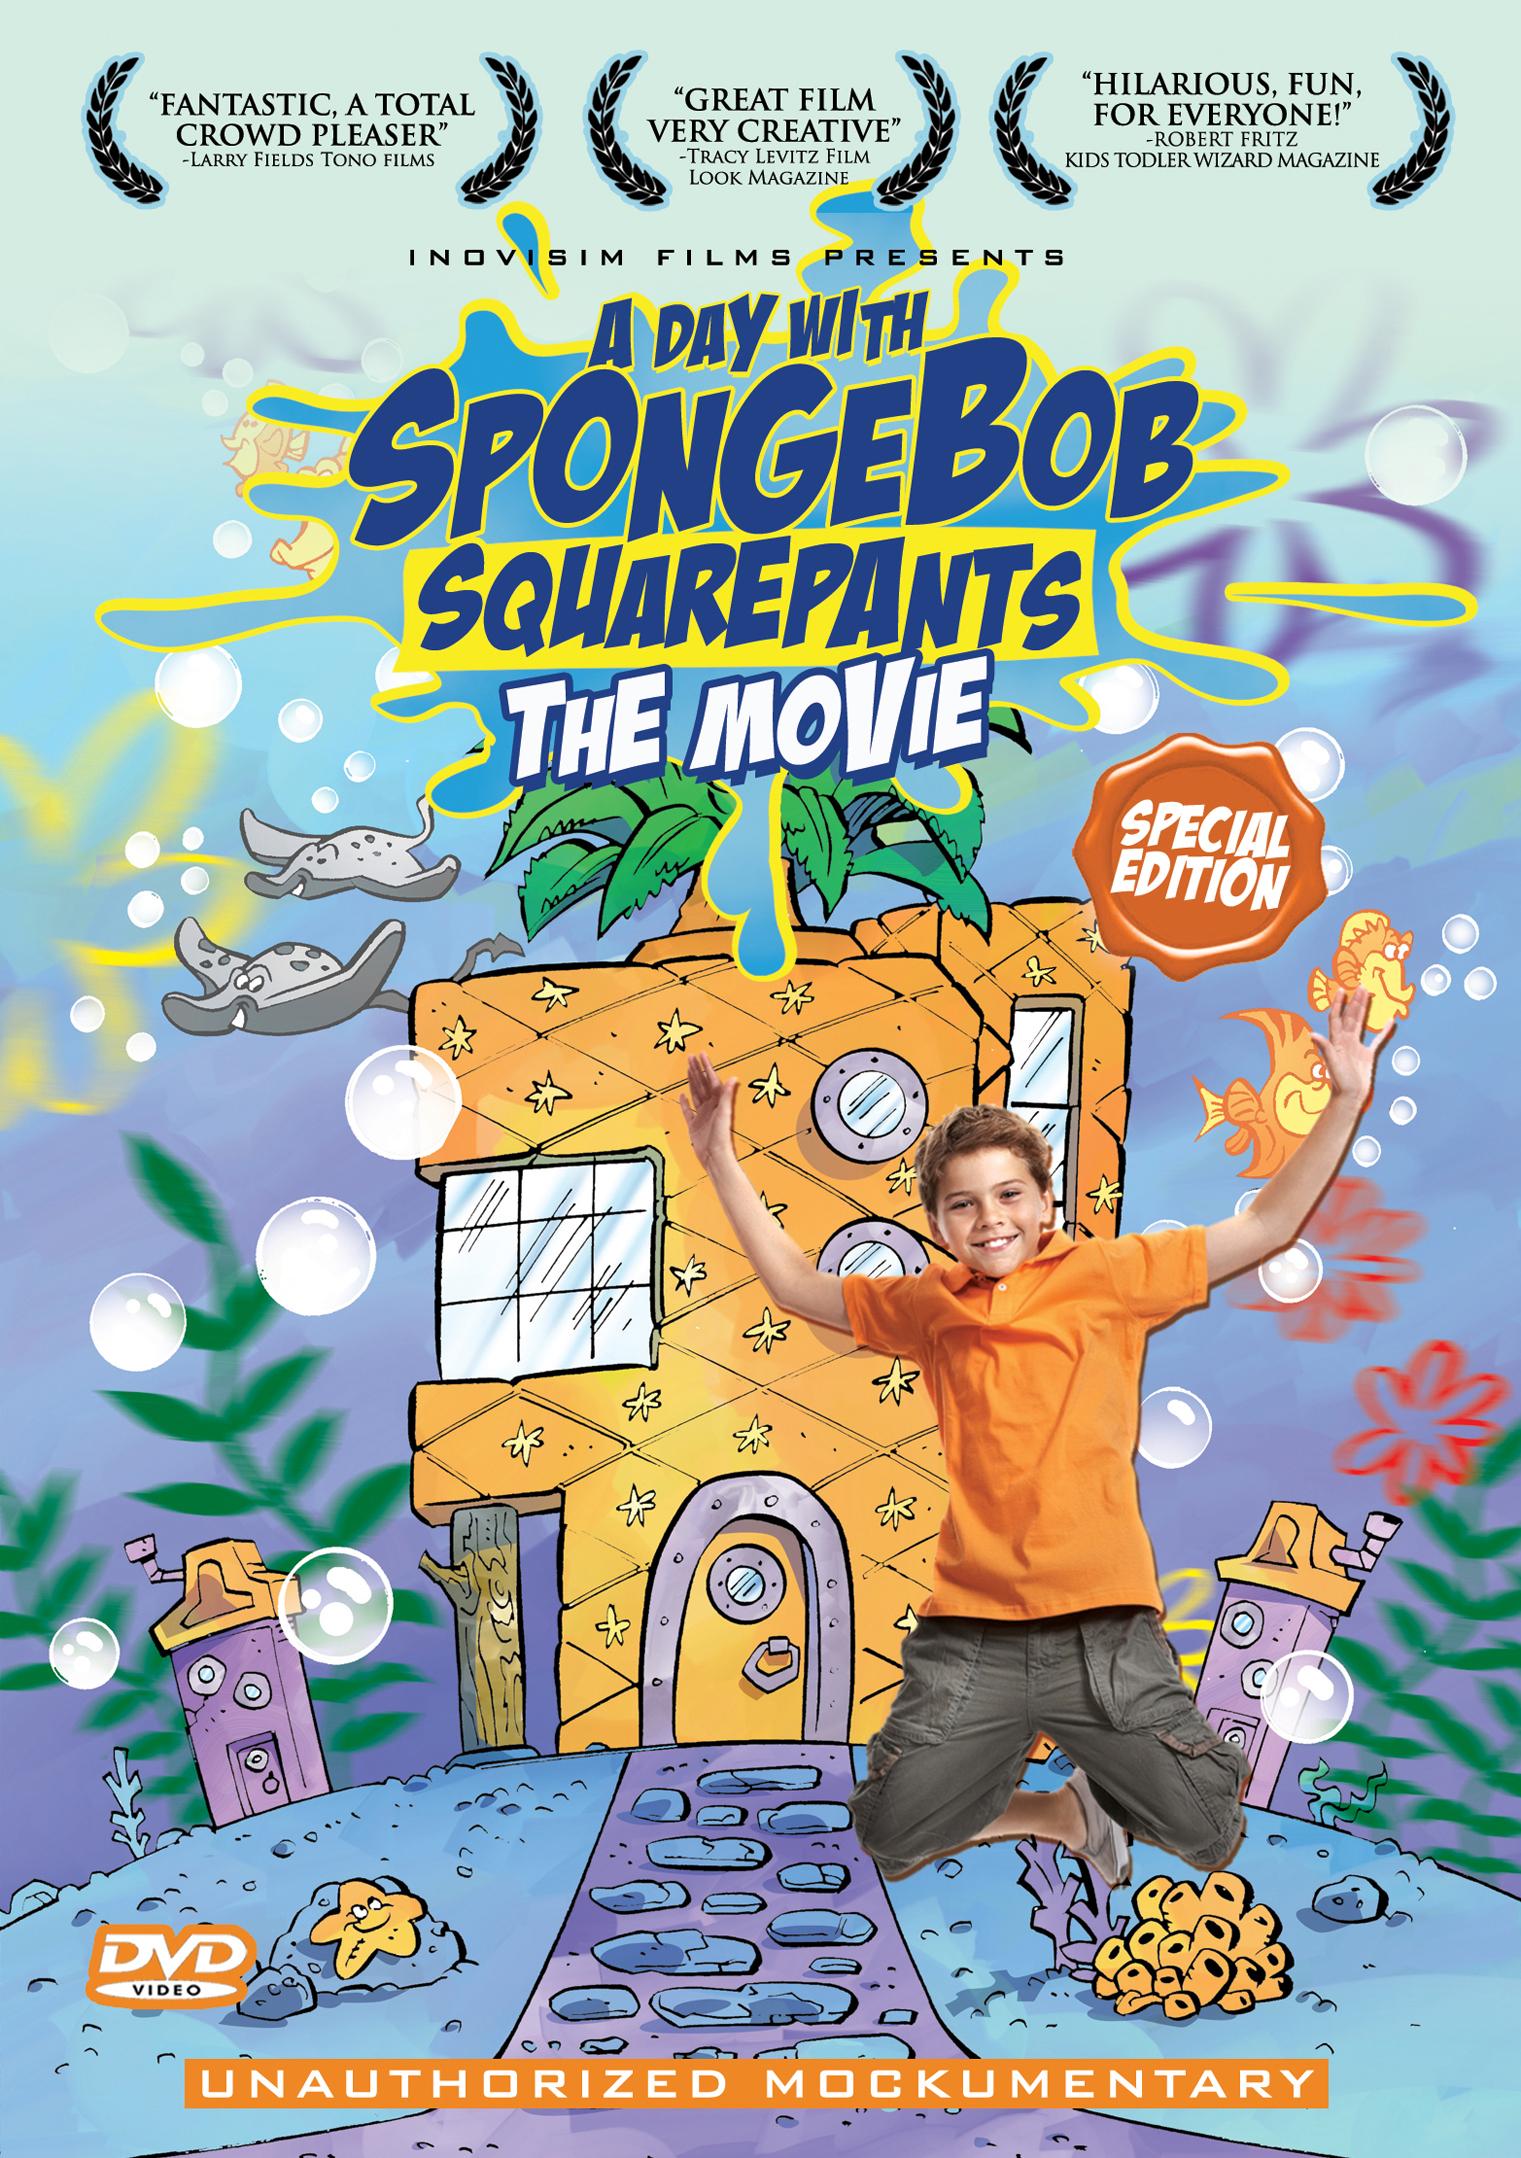 A day with spongebob squarepants the movie box art